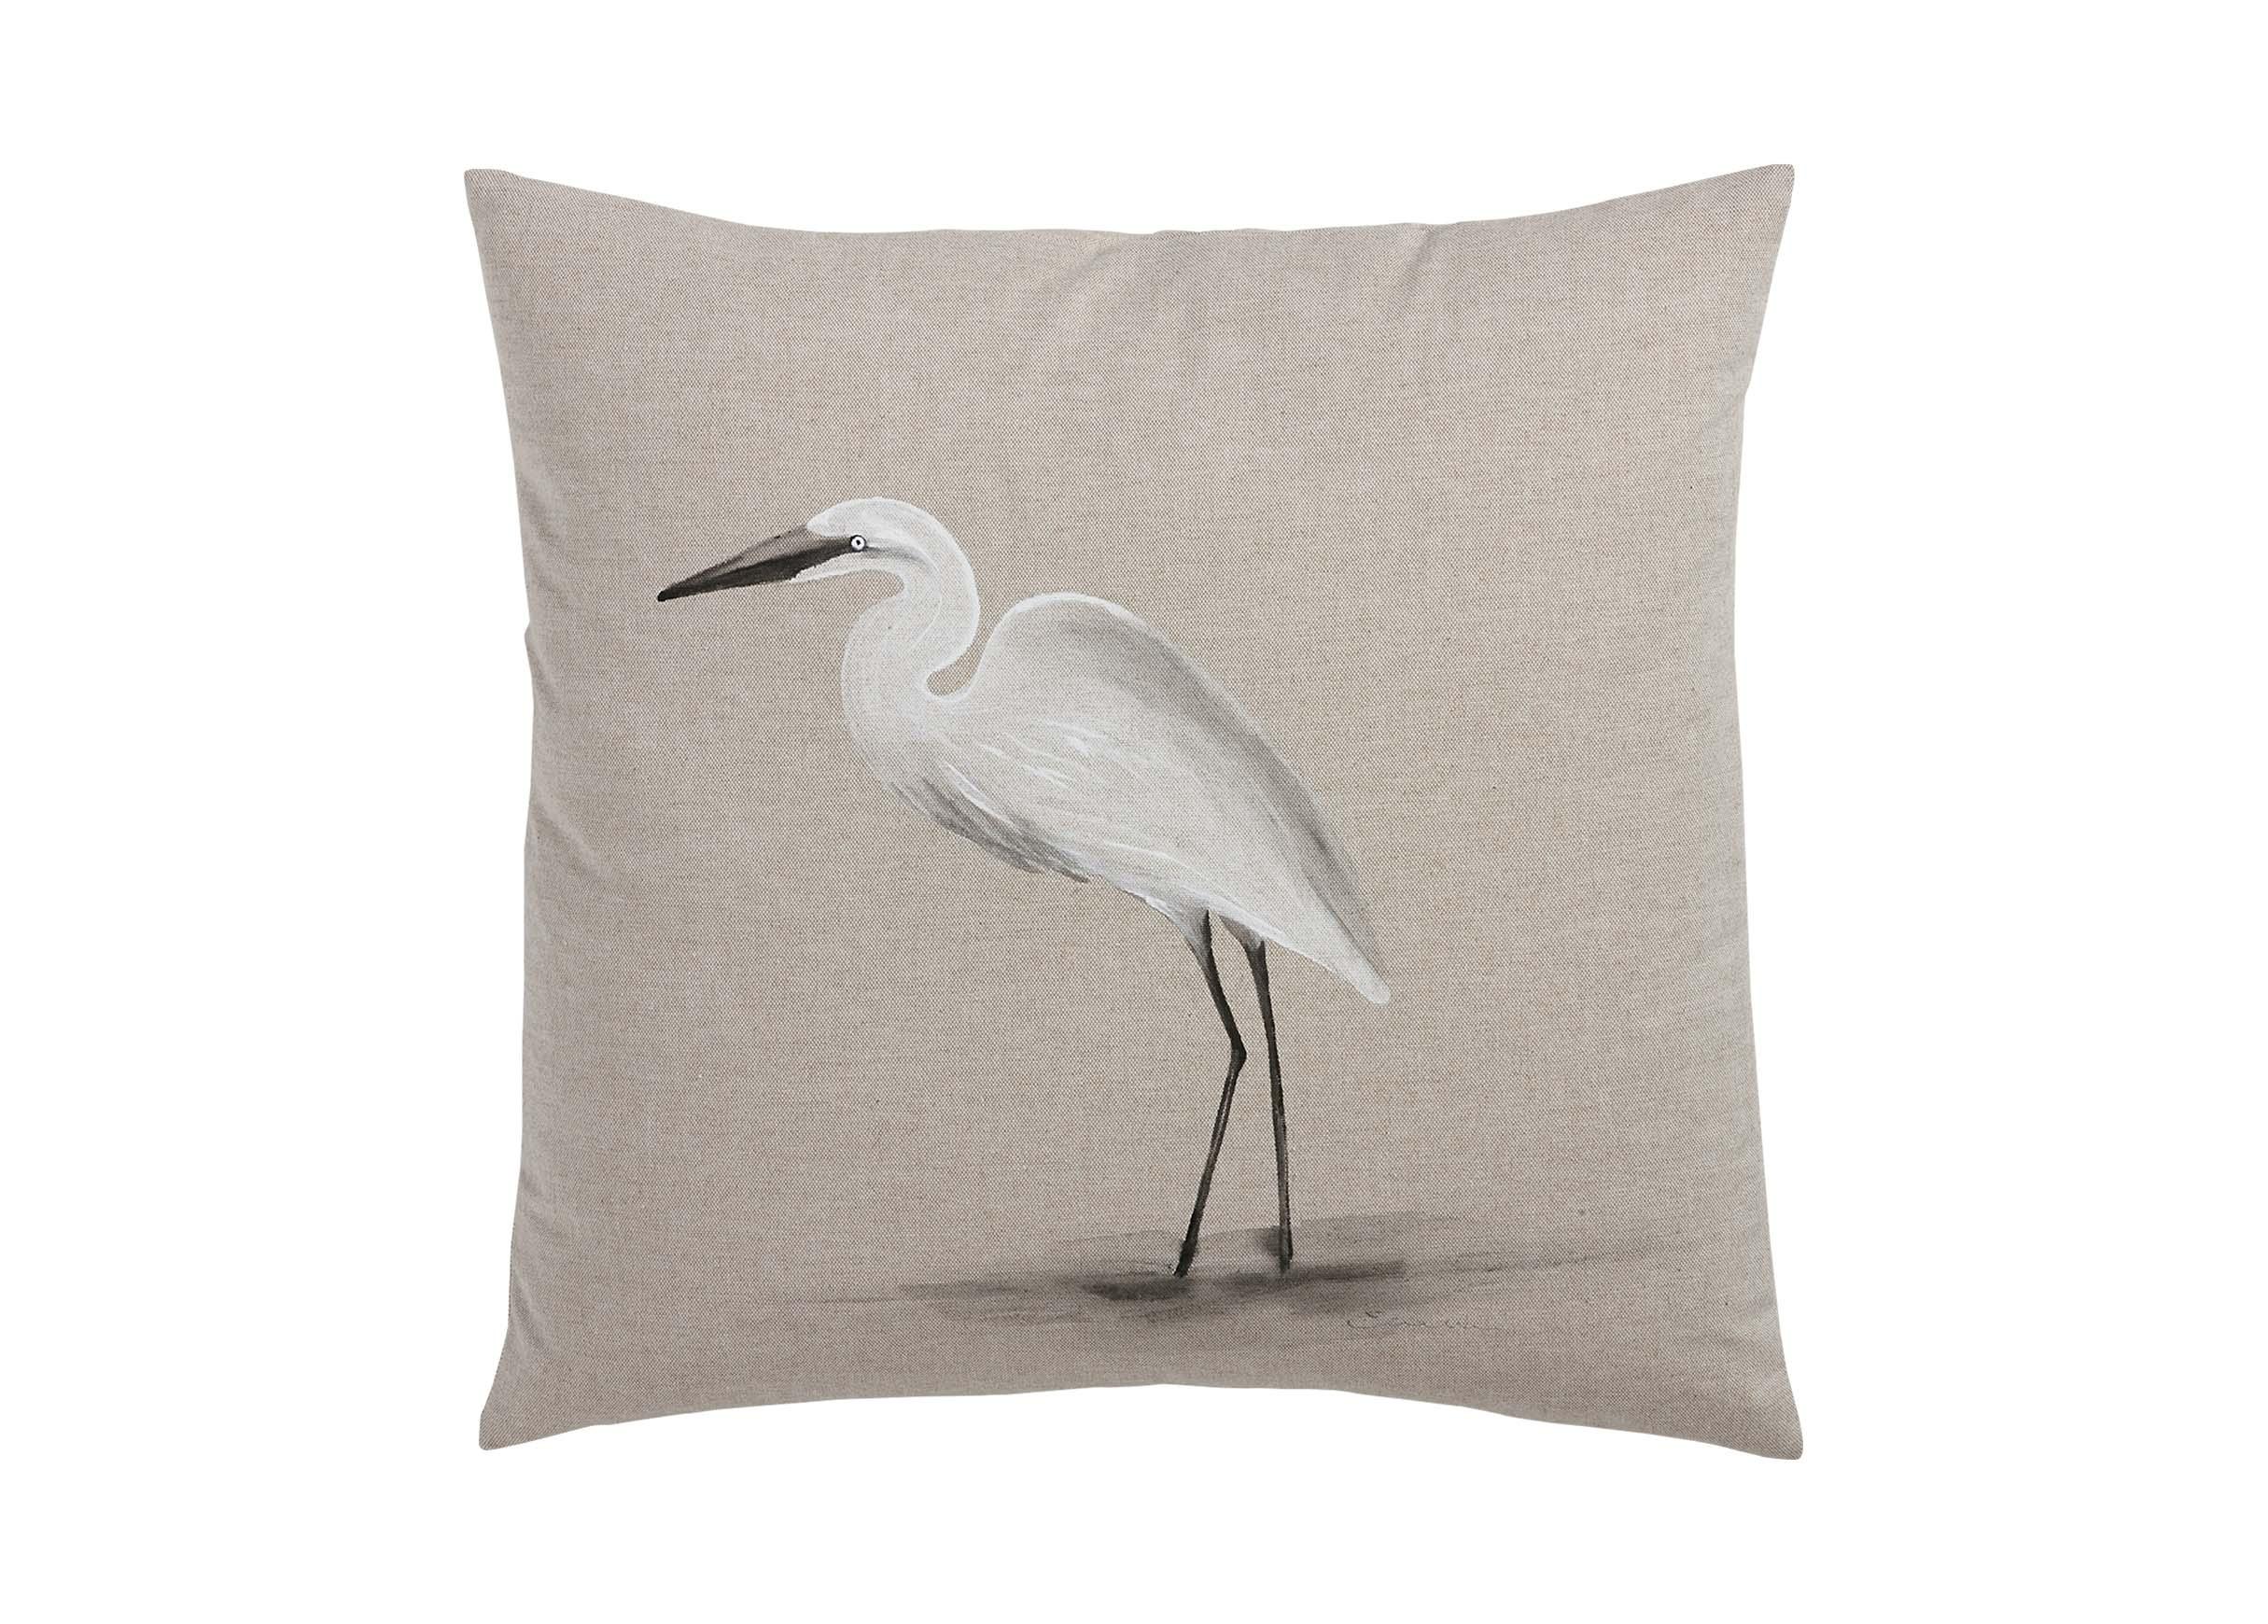 Hand painted bird on sand pillow pillows ethan allen for Hand painted pillows